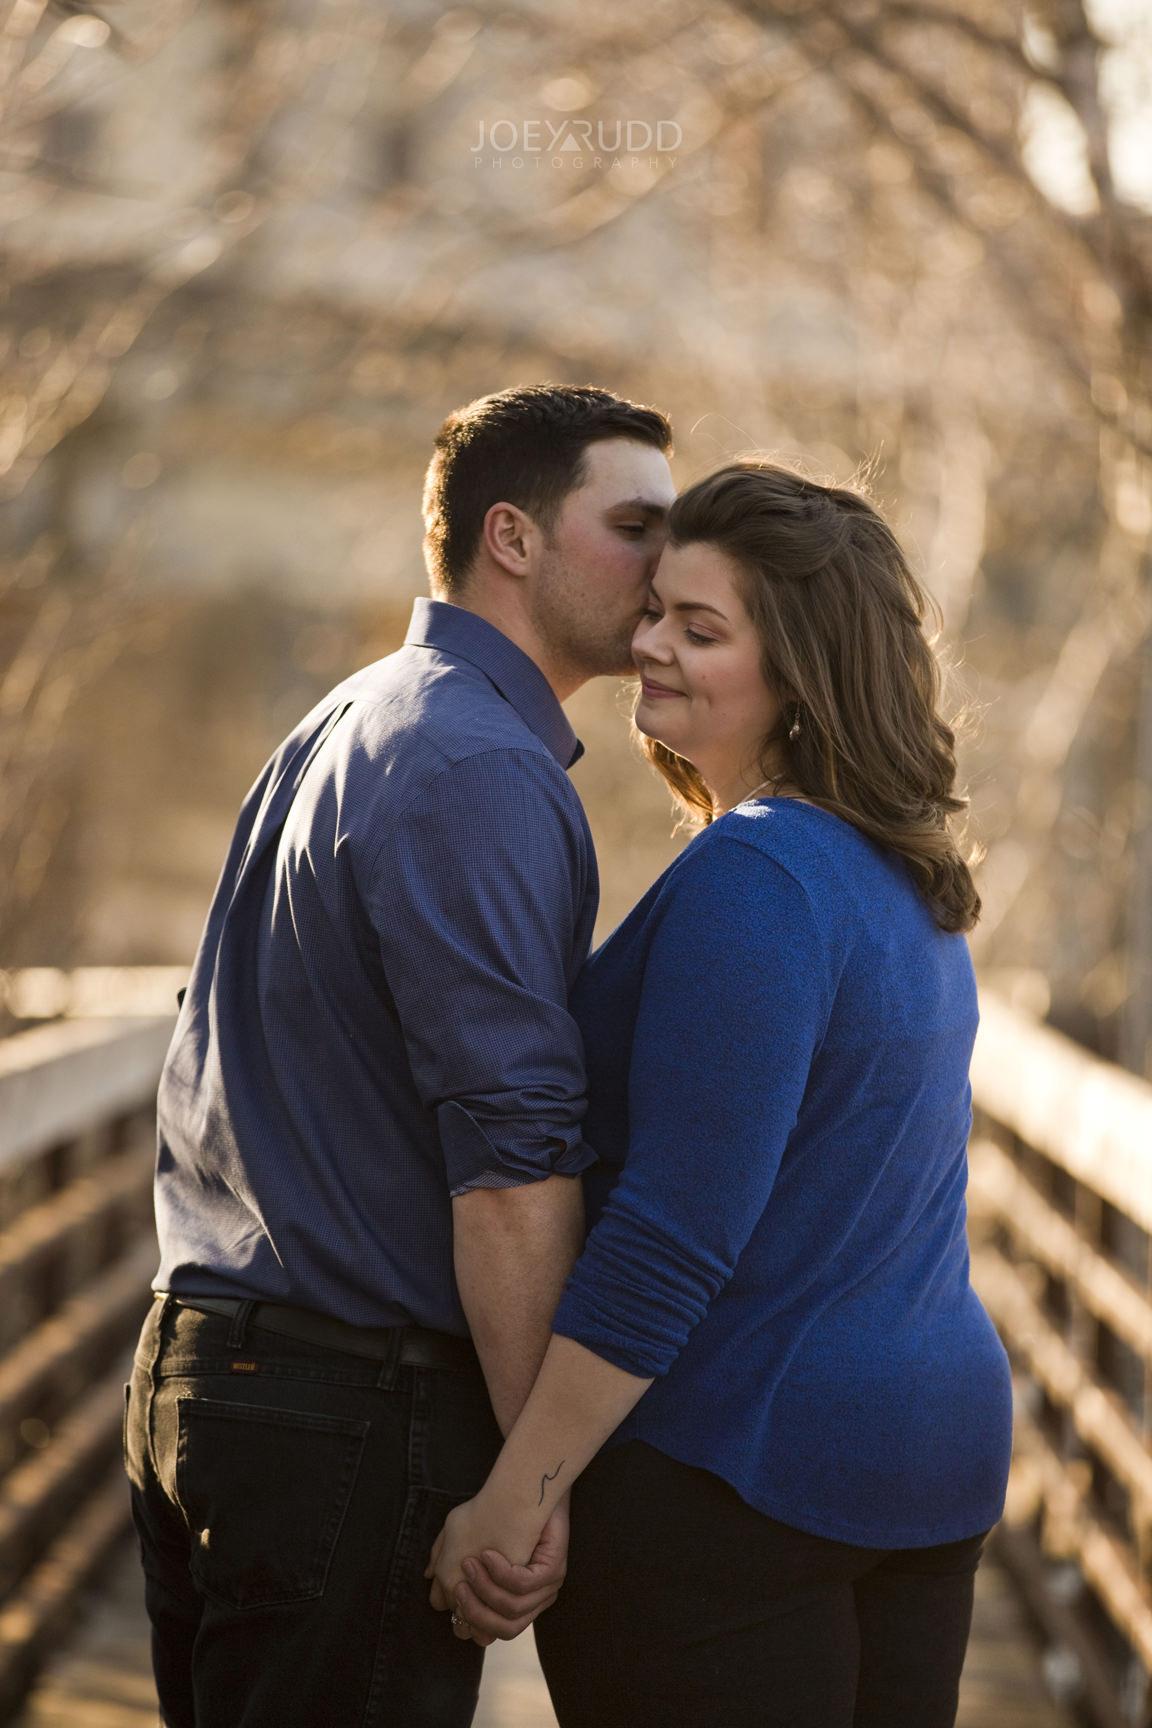 Almonte engagement photography by ottawa wedding photographer joey rudd photography love